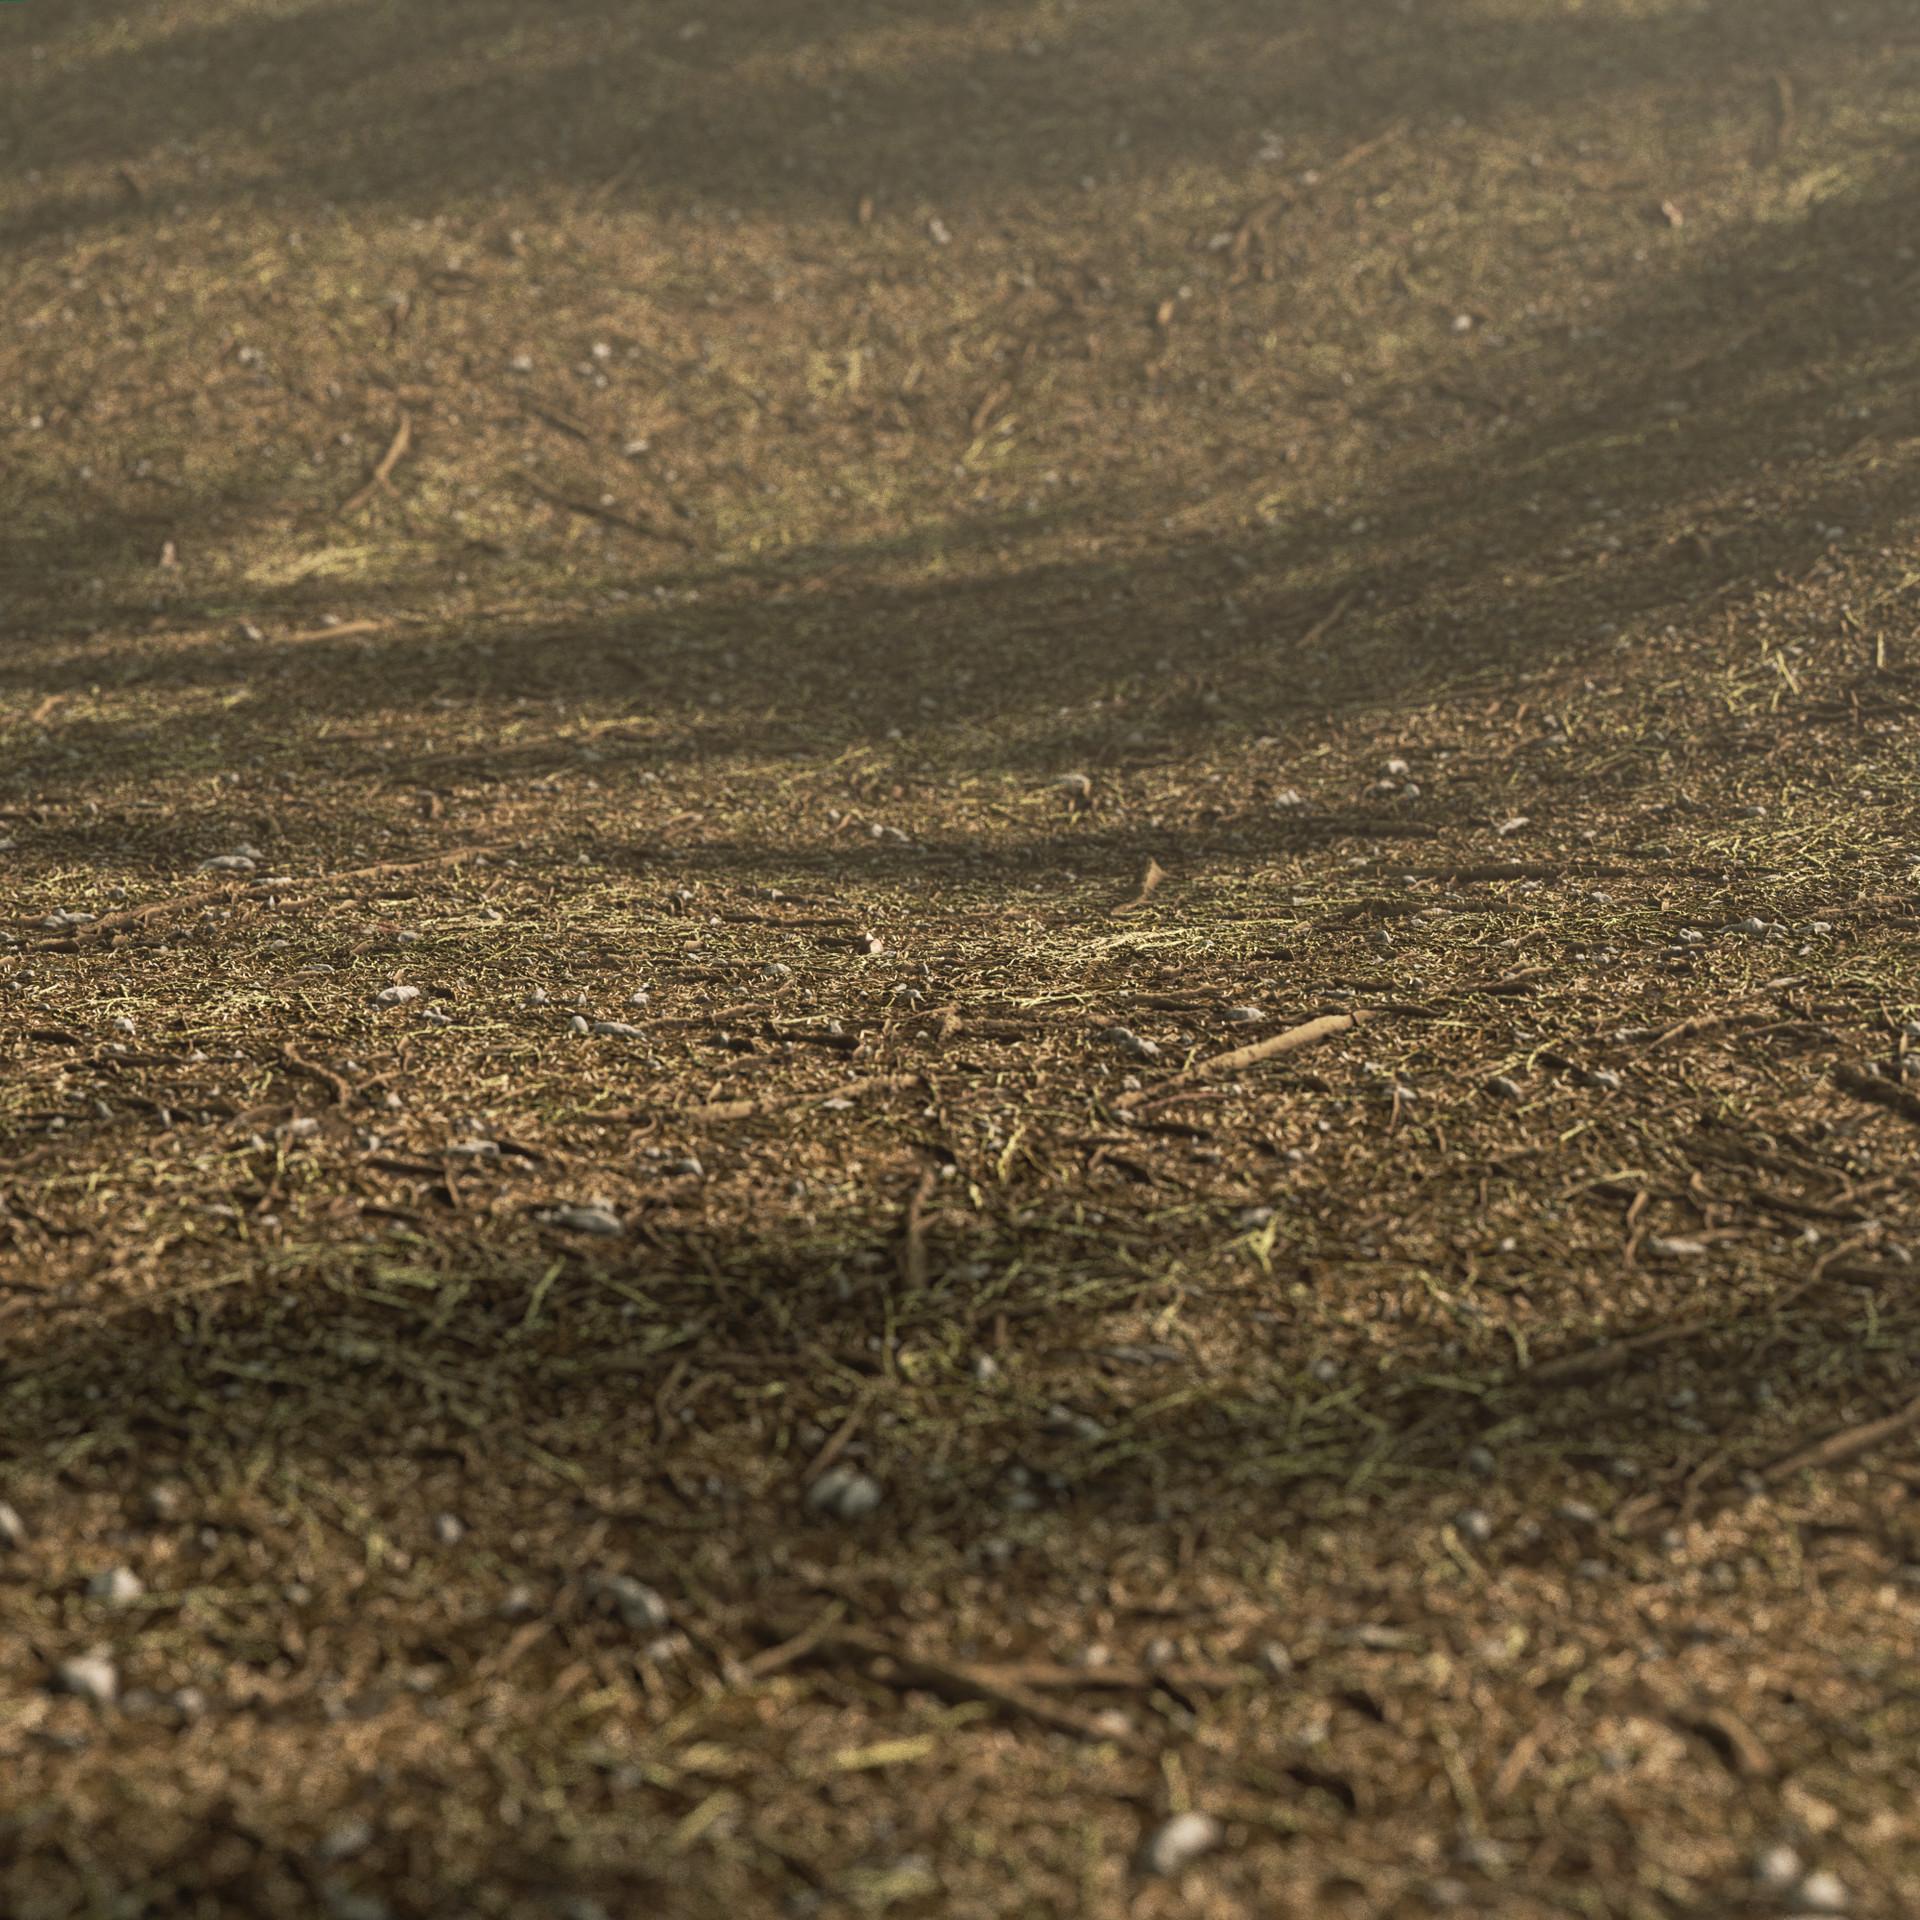 Cem tezcan autumn ground 00000 beauty